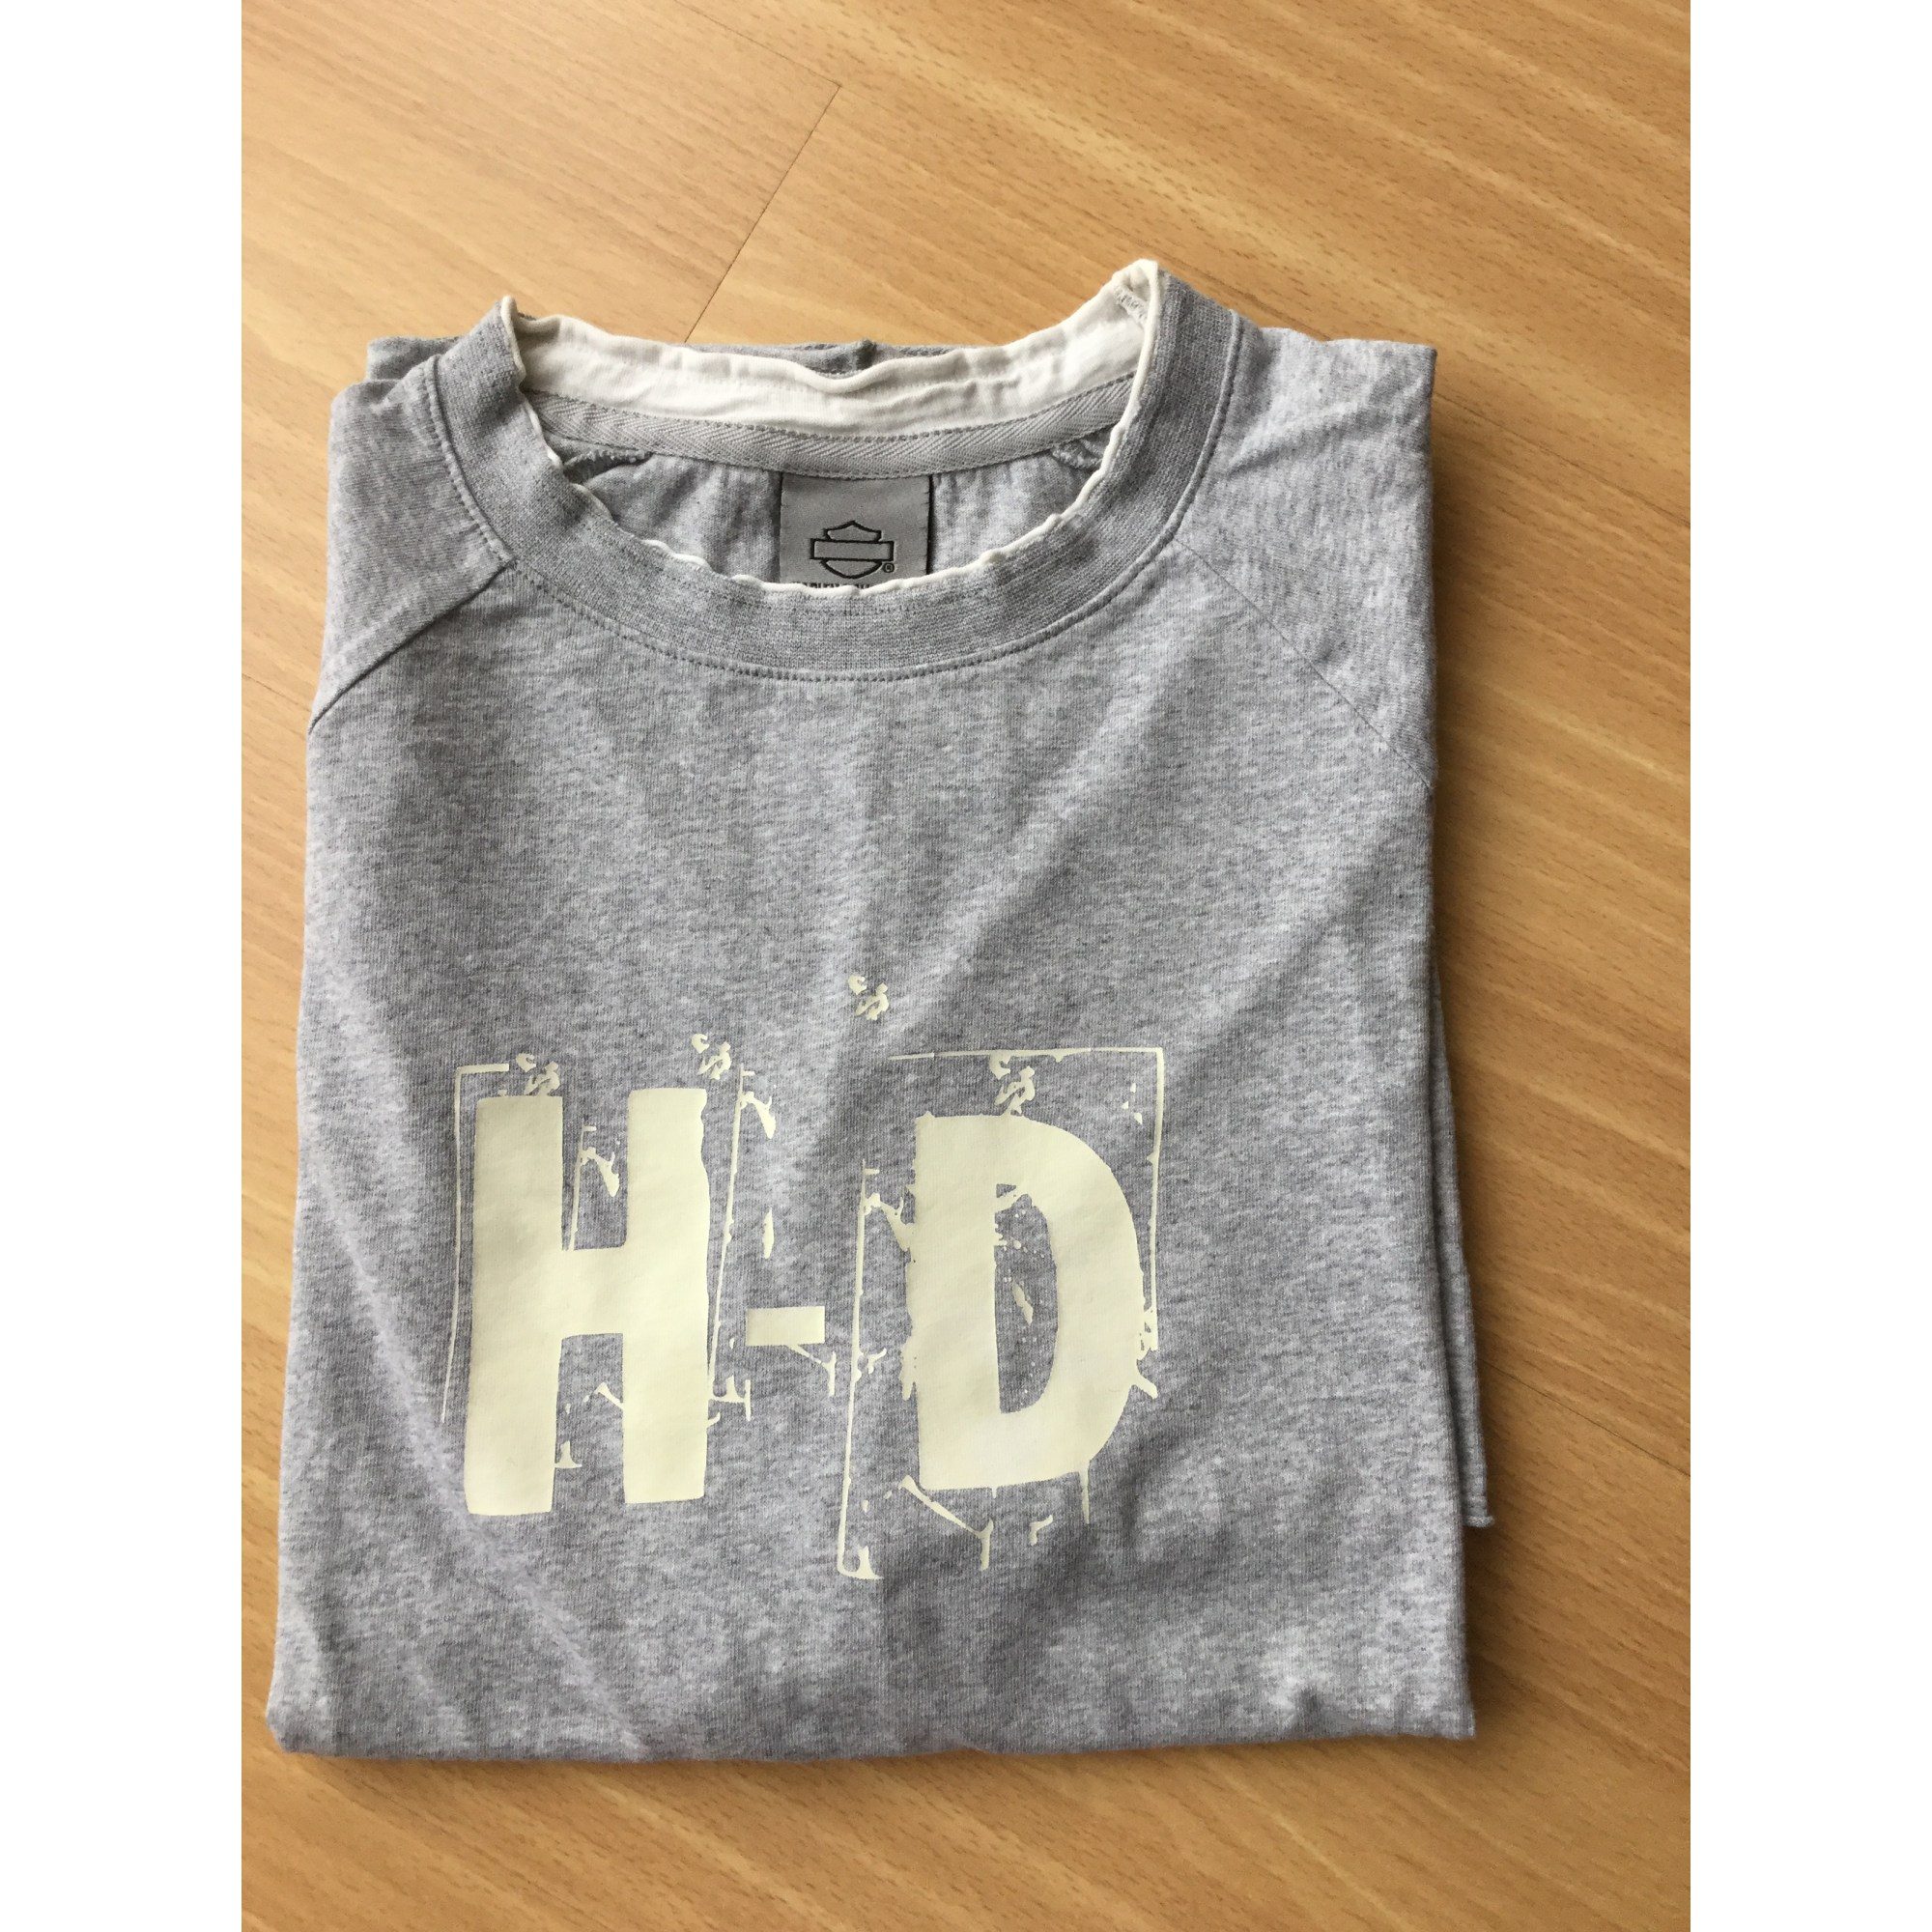 Tee-shirt HARLEY DAVIDSON 3 (L) gris - 4966517 74654fec2f4